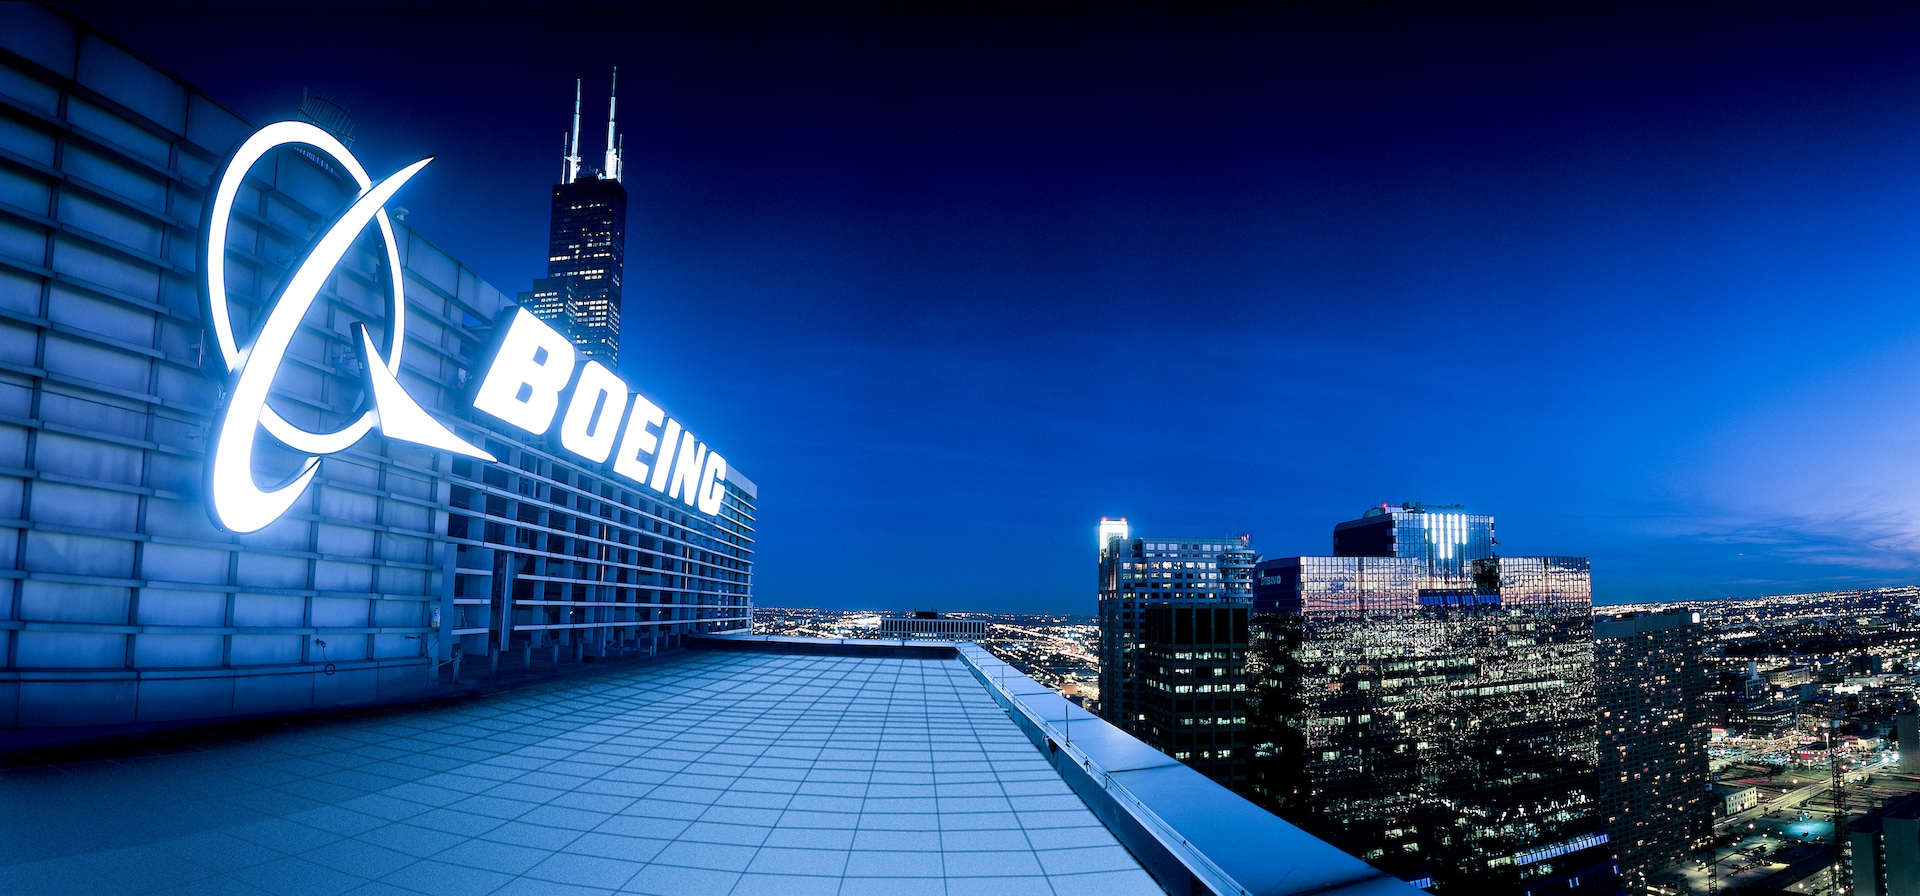 Sídlo Boeingu v Chicagu